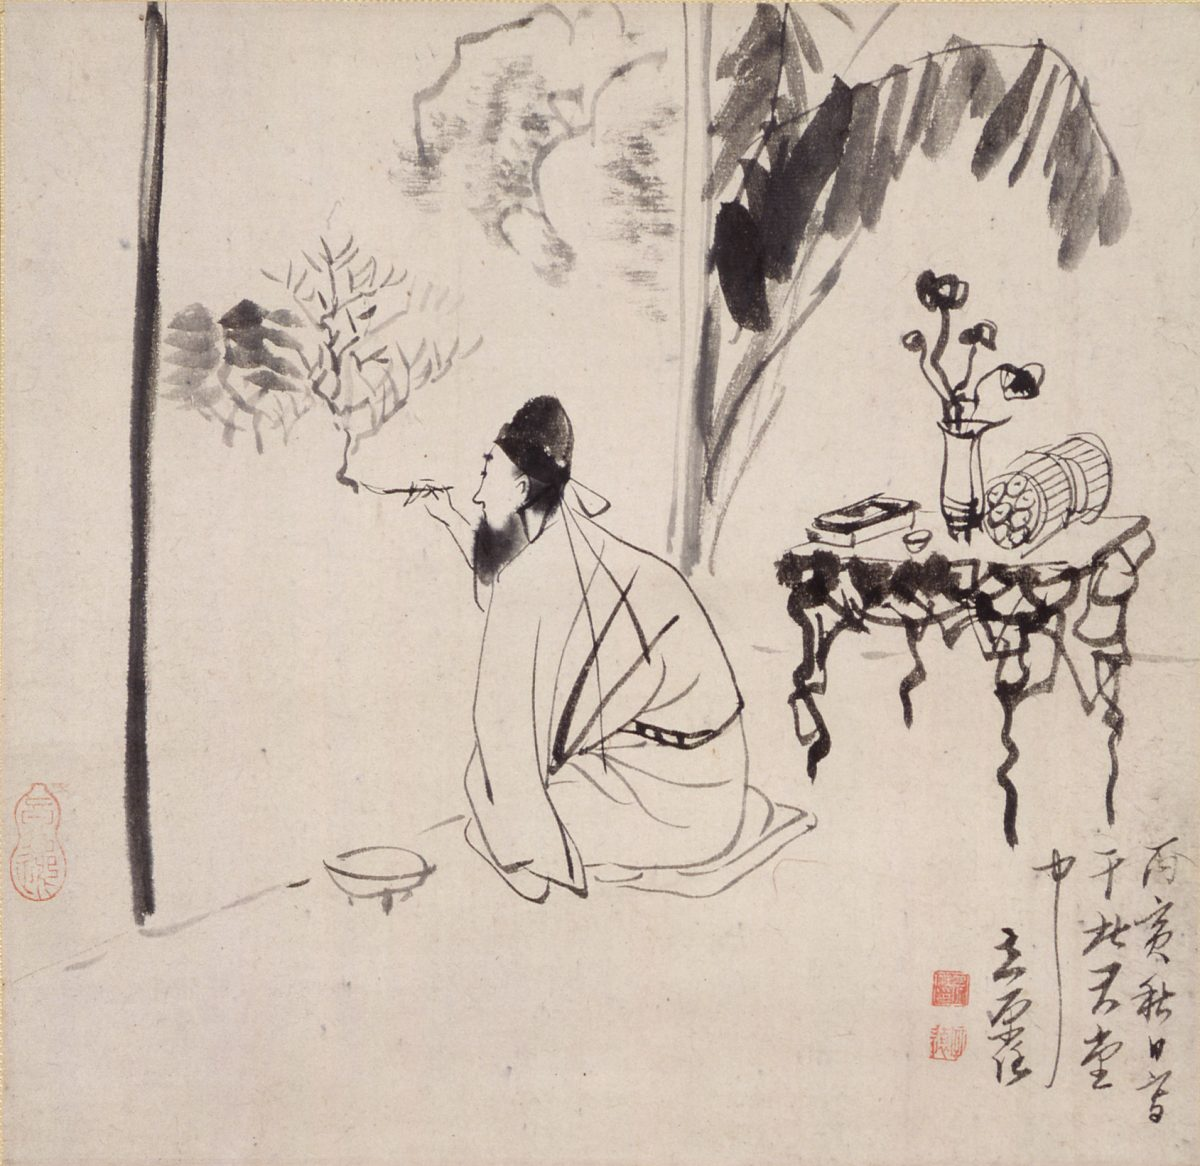 Japanese man painting ink